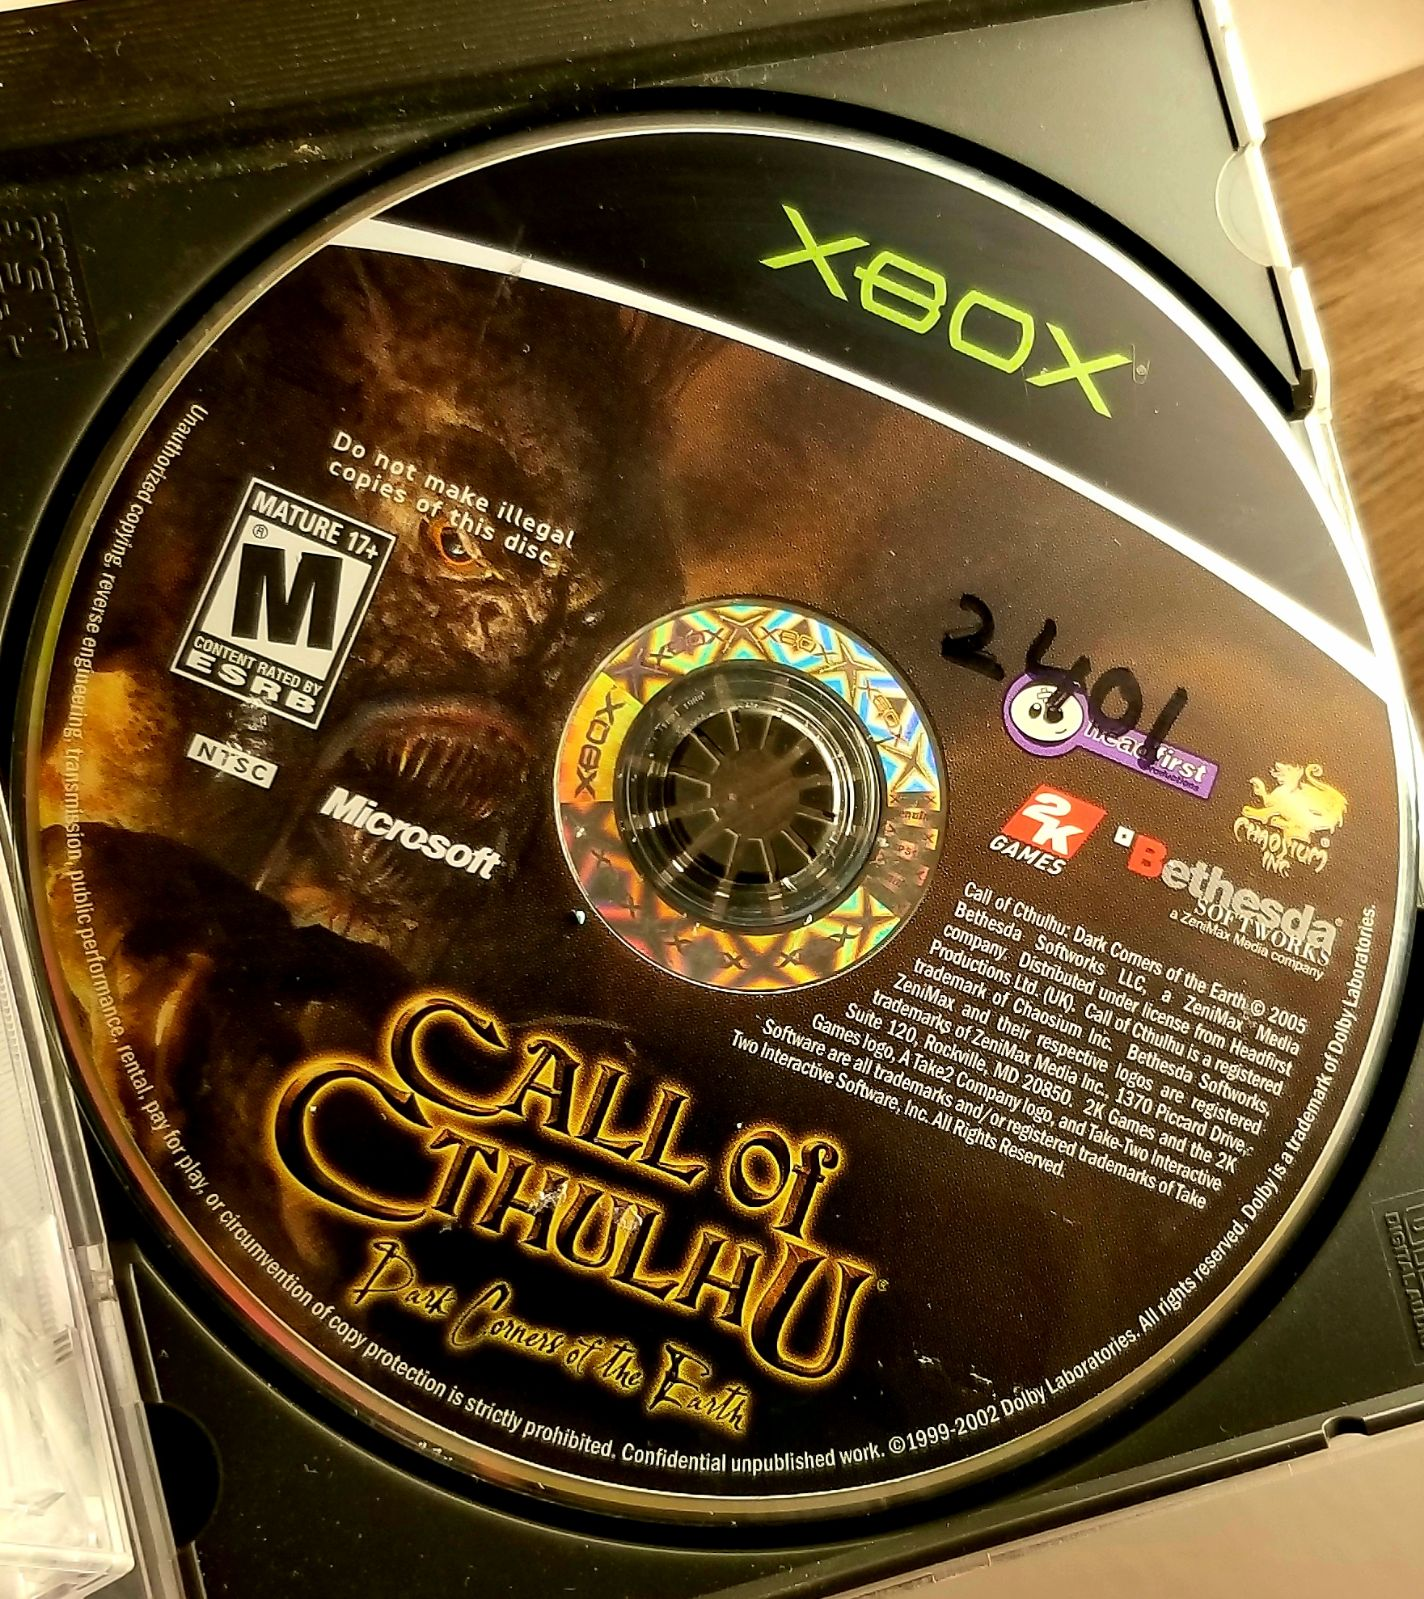 Call of Cthulhu OG xbox